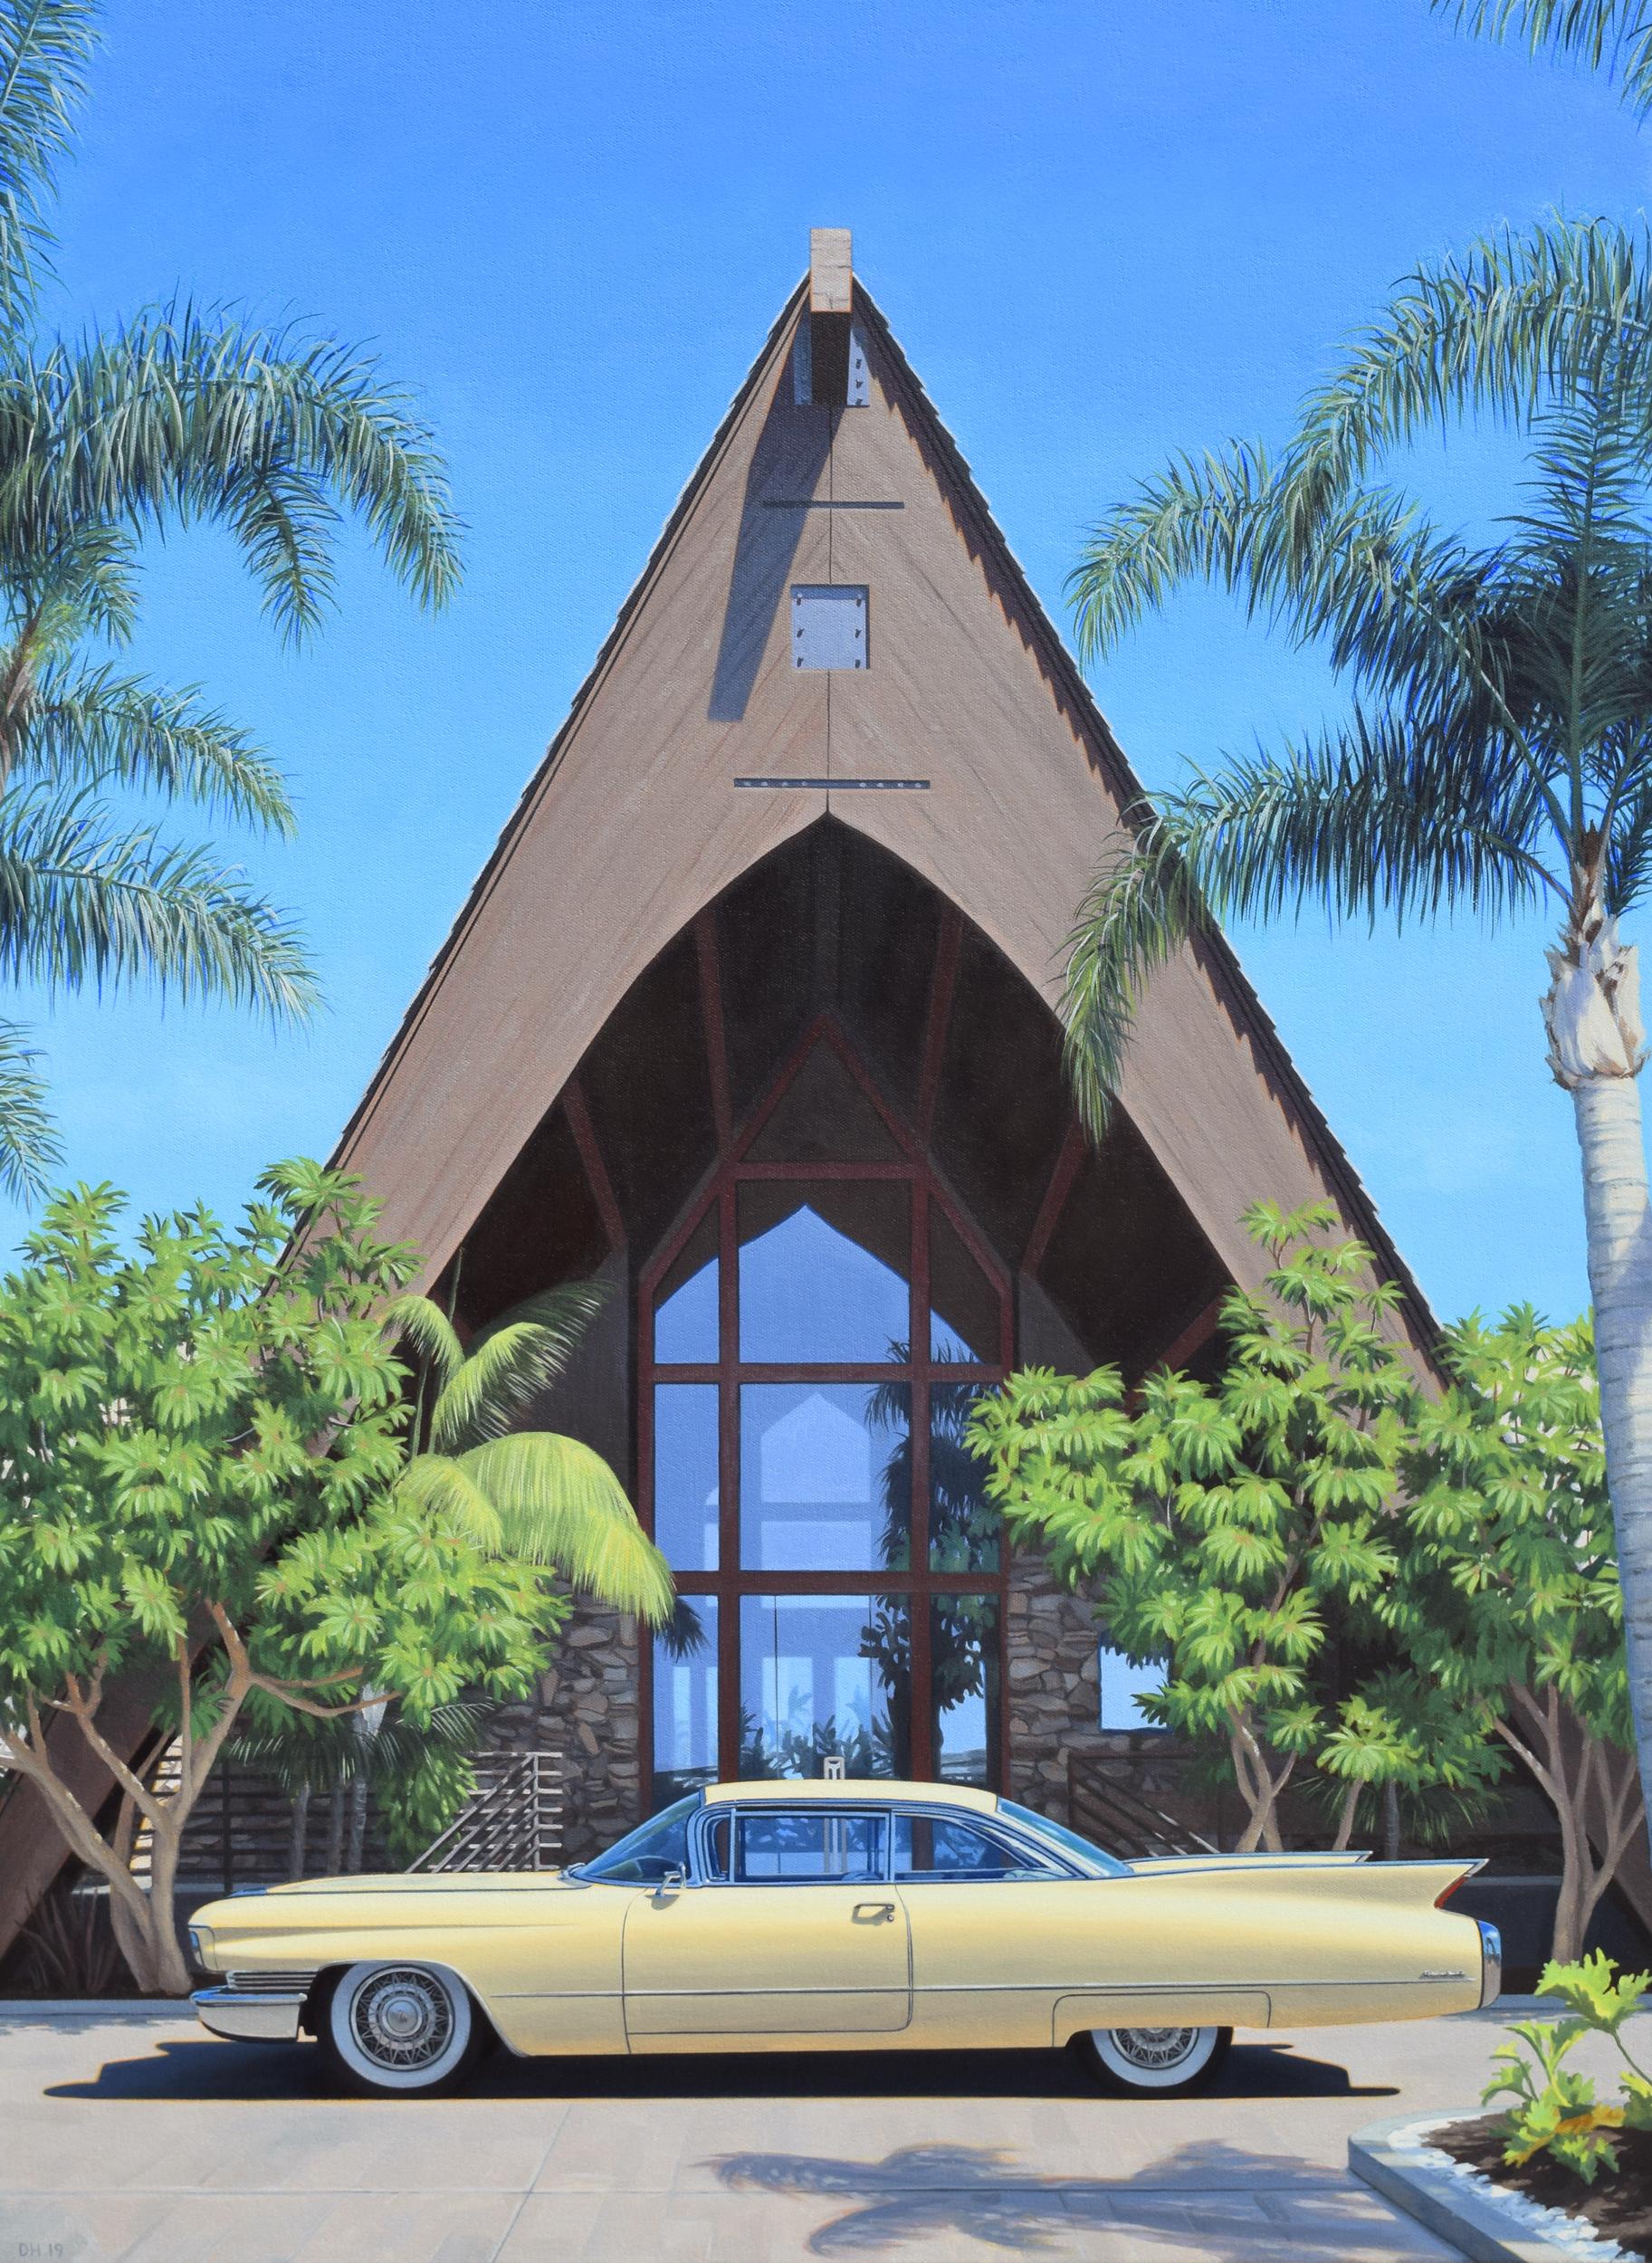 Humphrey's Cadillac